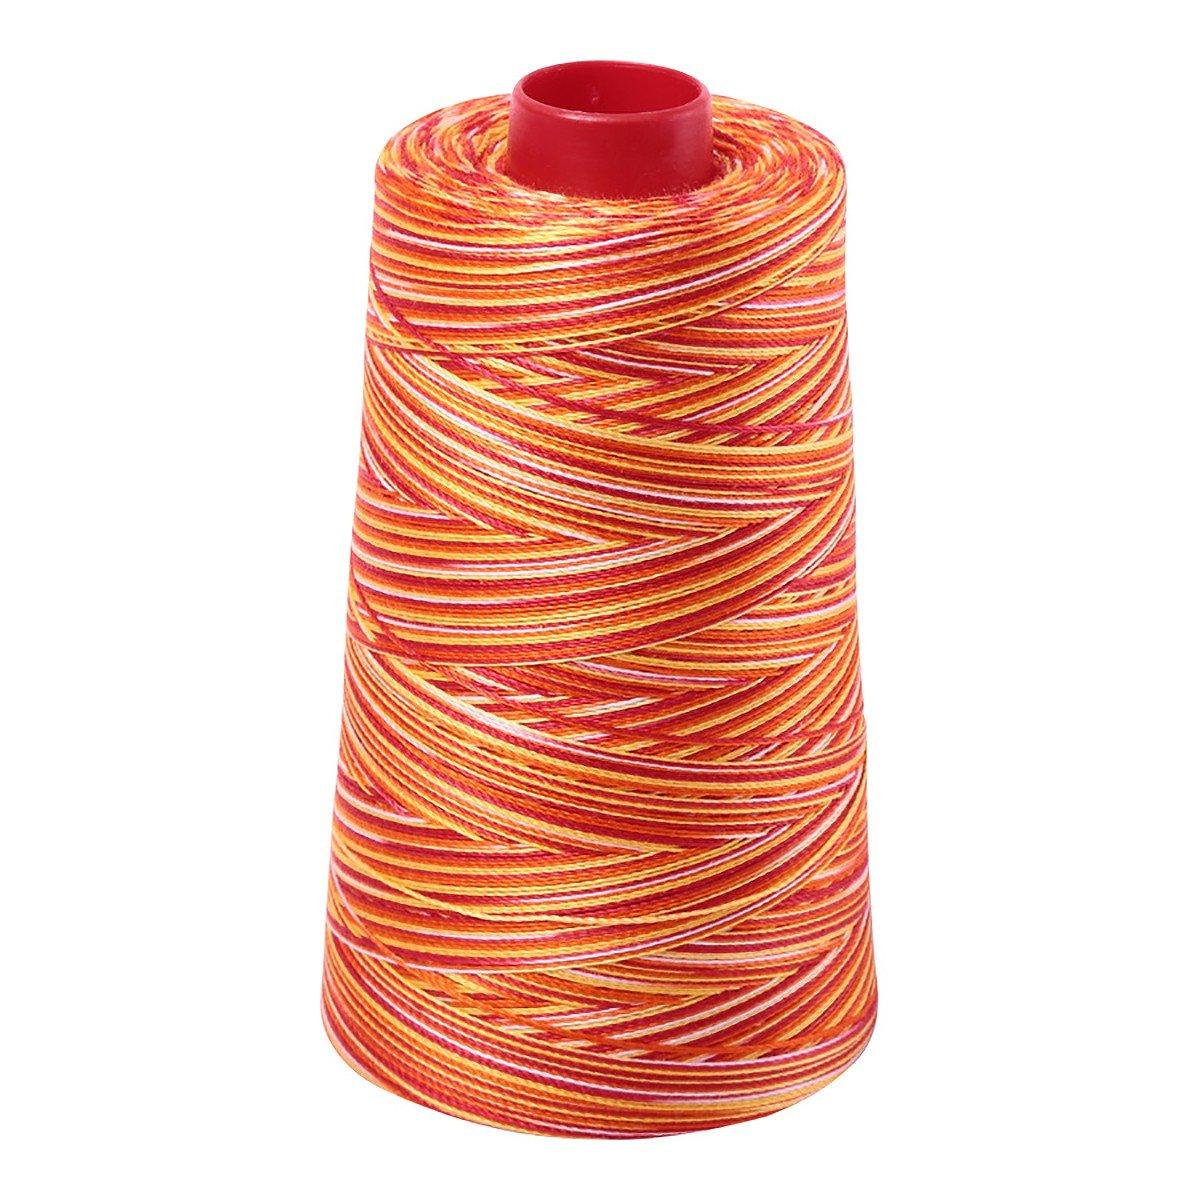 Mako (Cotton) Embroidery Thread 12wt 1931yd Variegated Tramonto a Zoagli